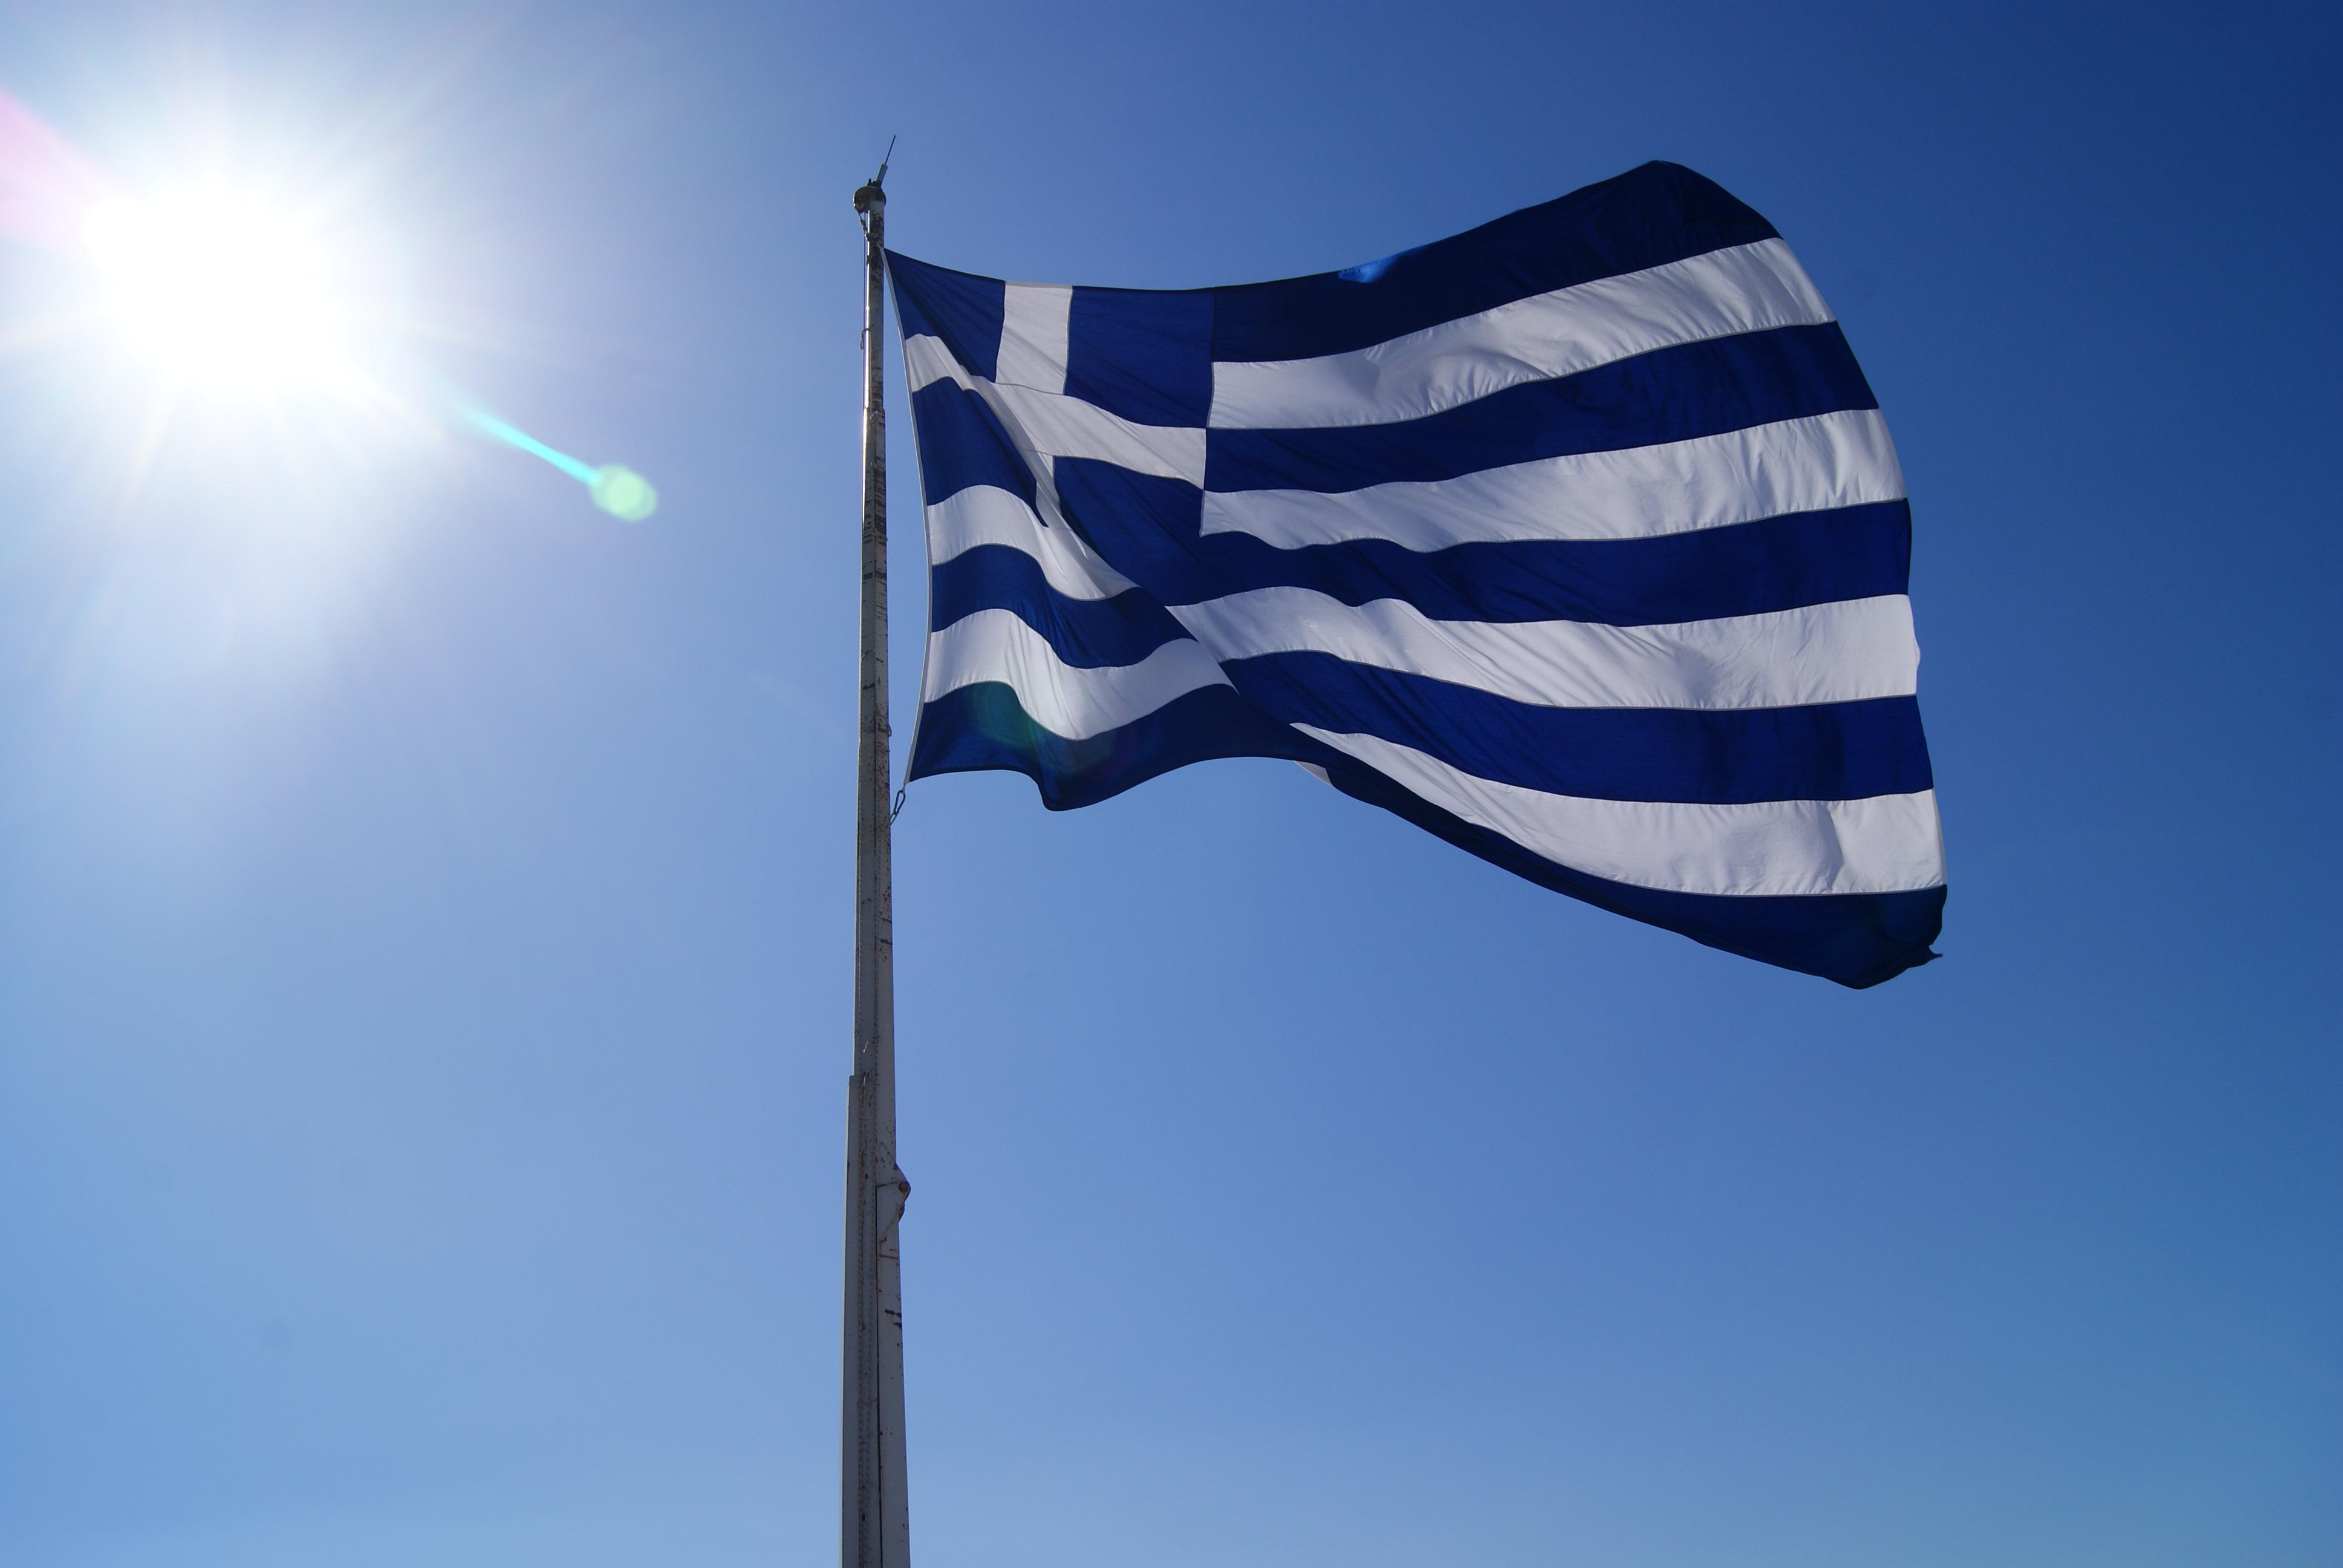 Voluntariado en Grecia sobre comunicación social